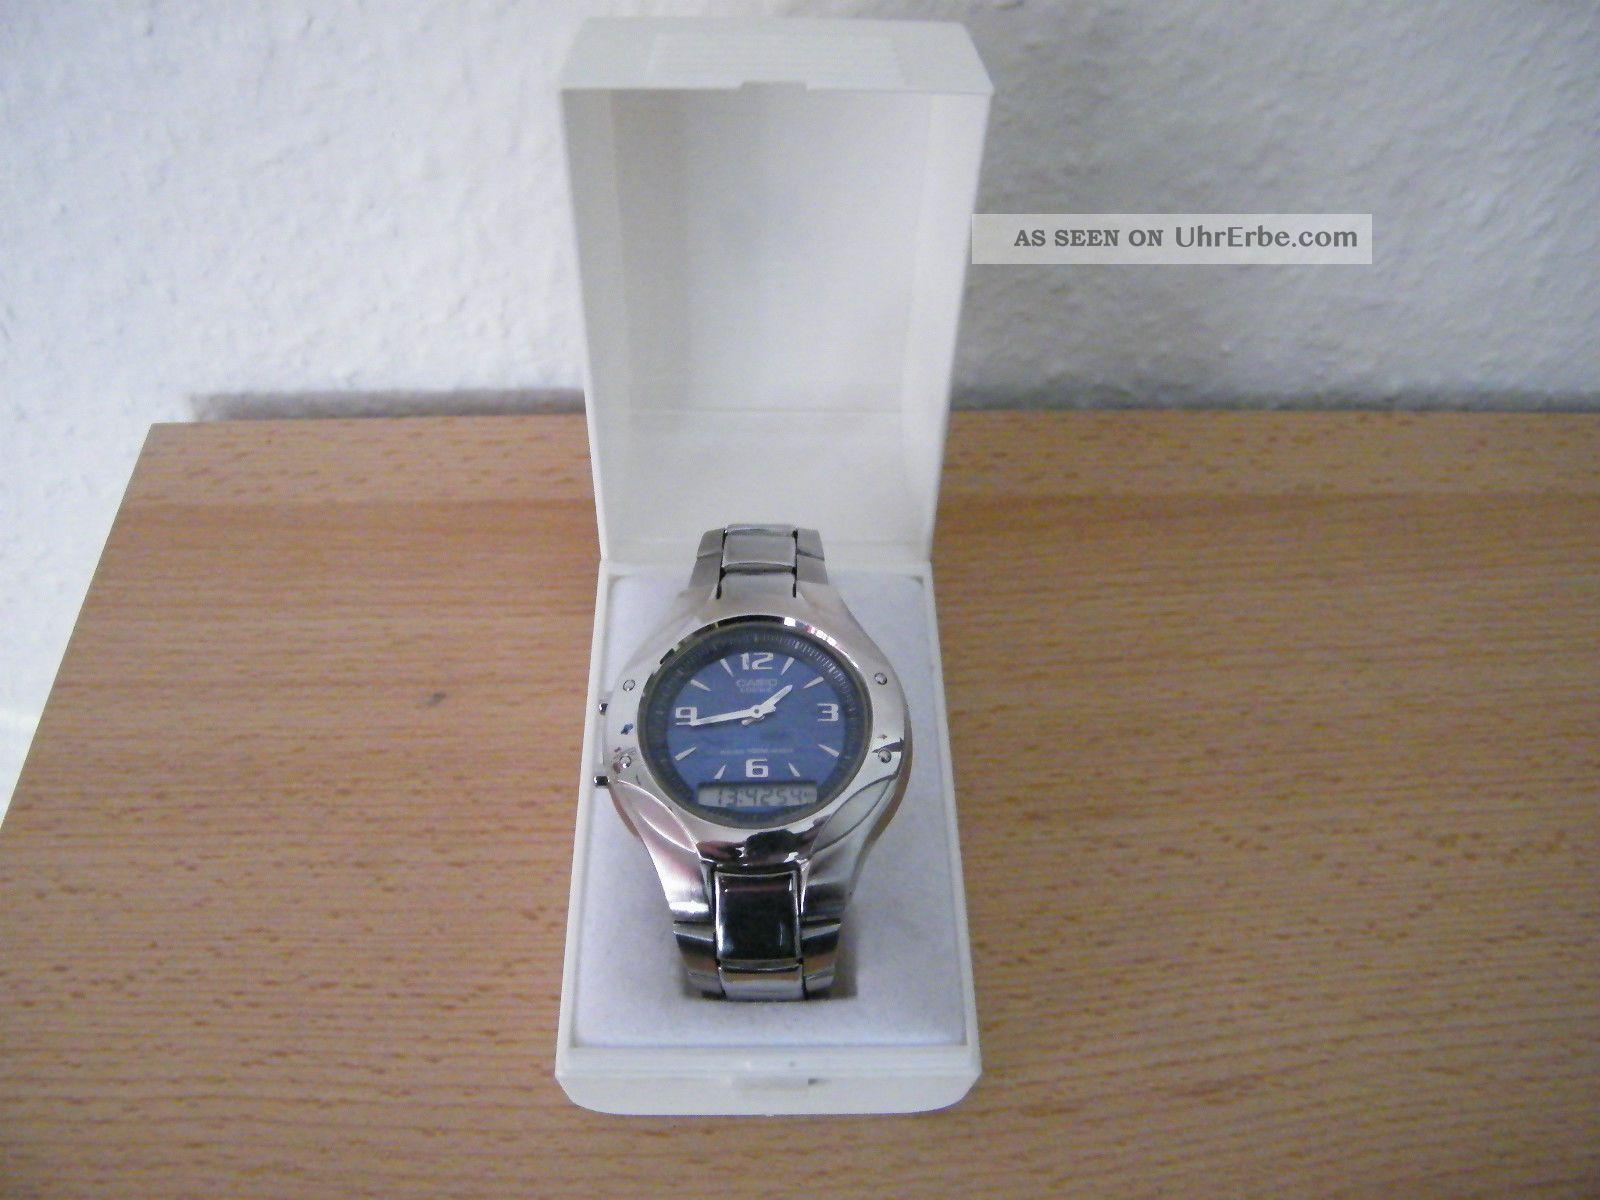 Casio Edifice Wunderschöne Armband Uhr Mit Edelstahl Armband Armbanduhren Bild